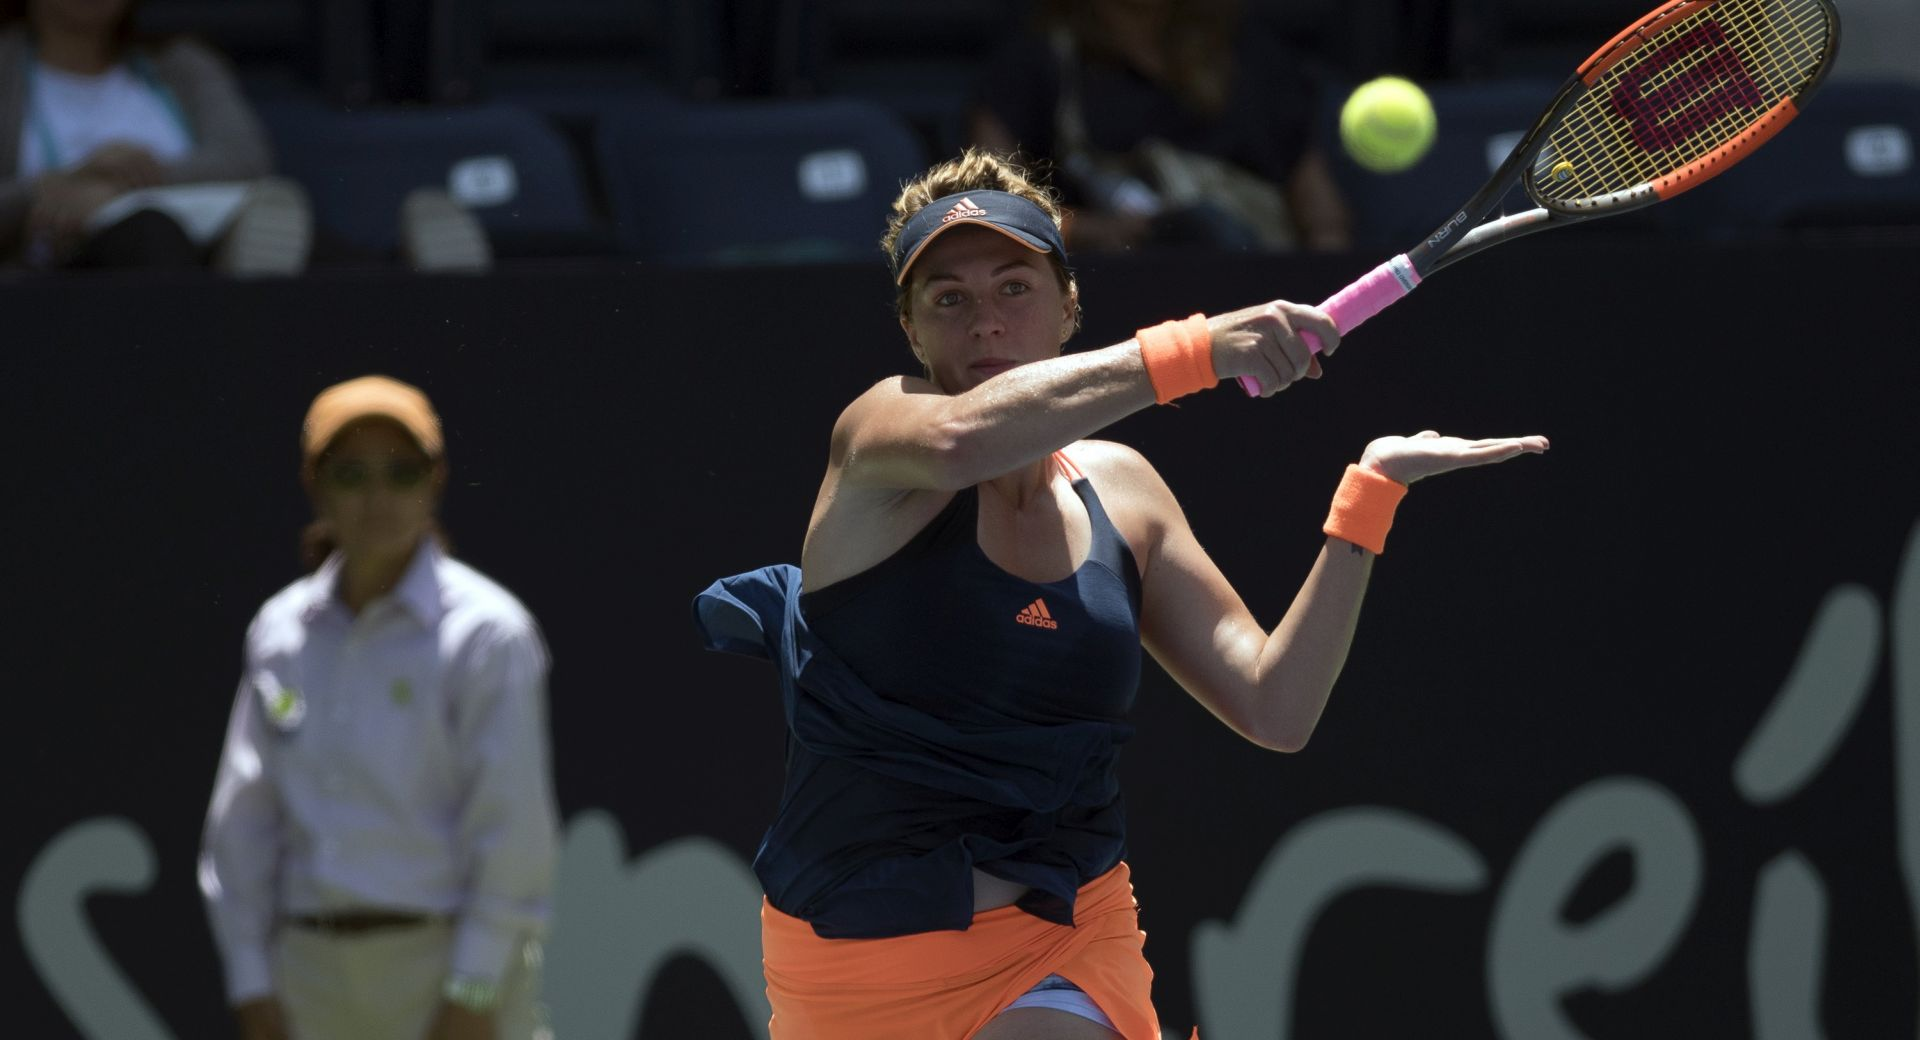 WTA MONTERREY Naslov za Pavljučenko